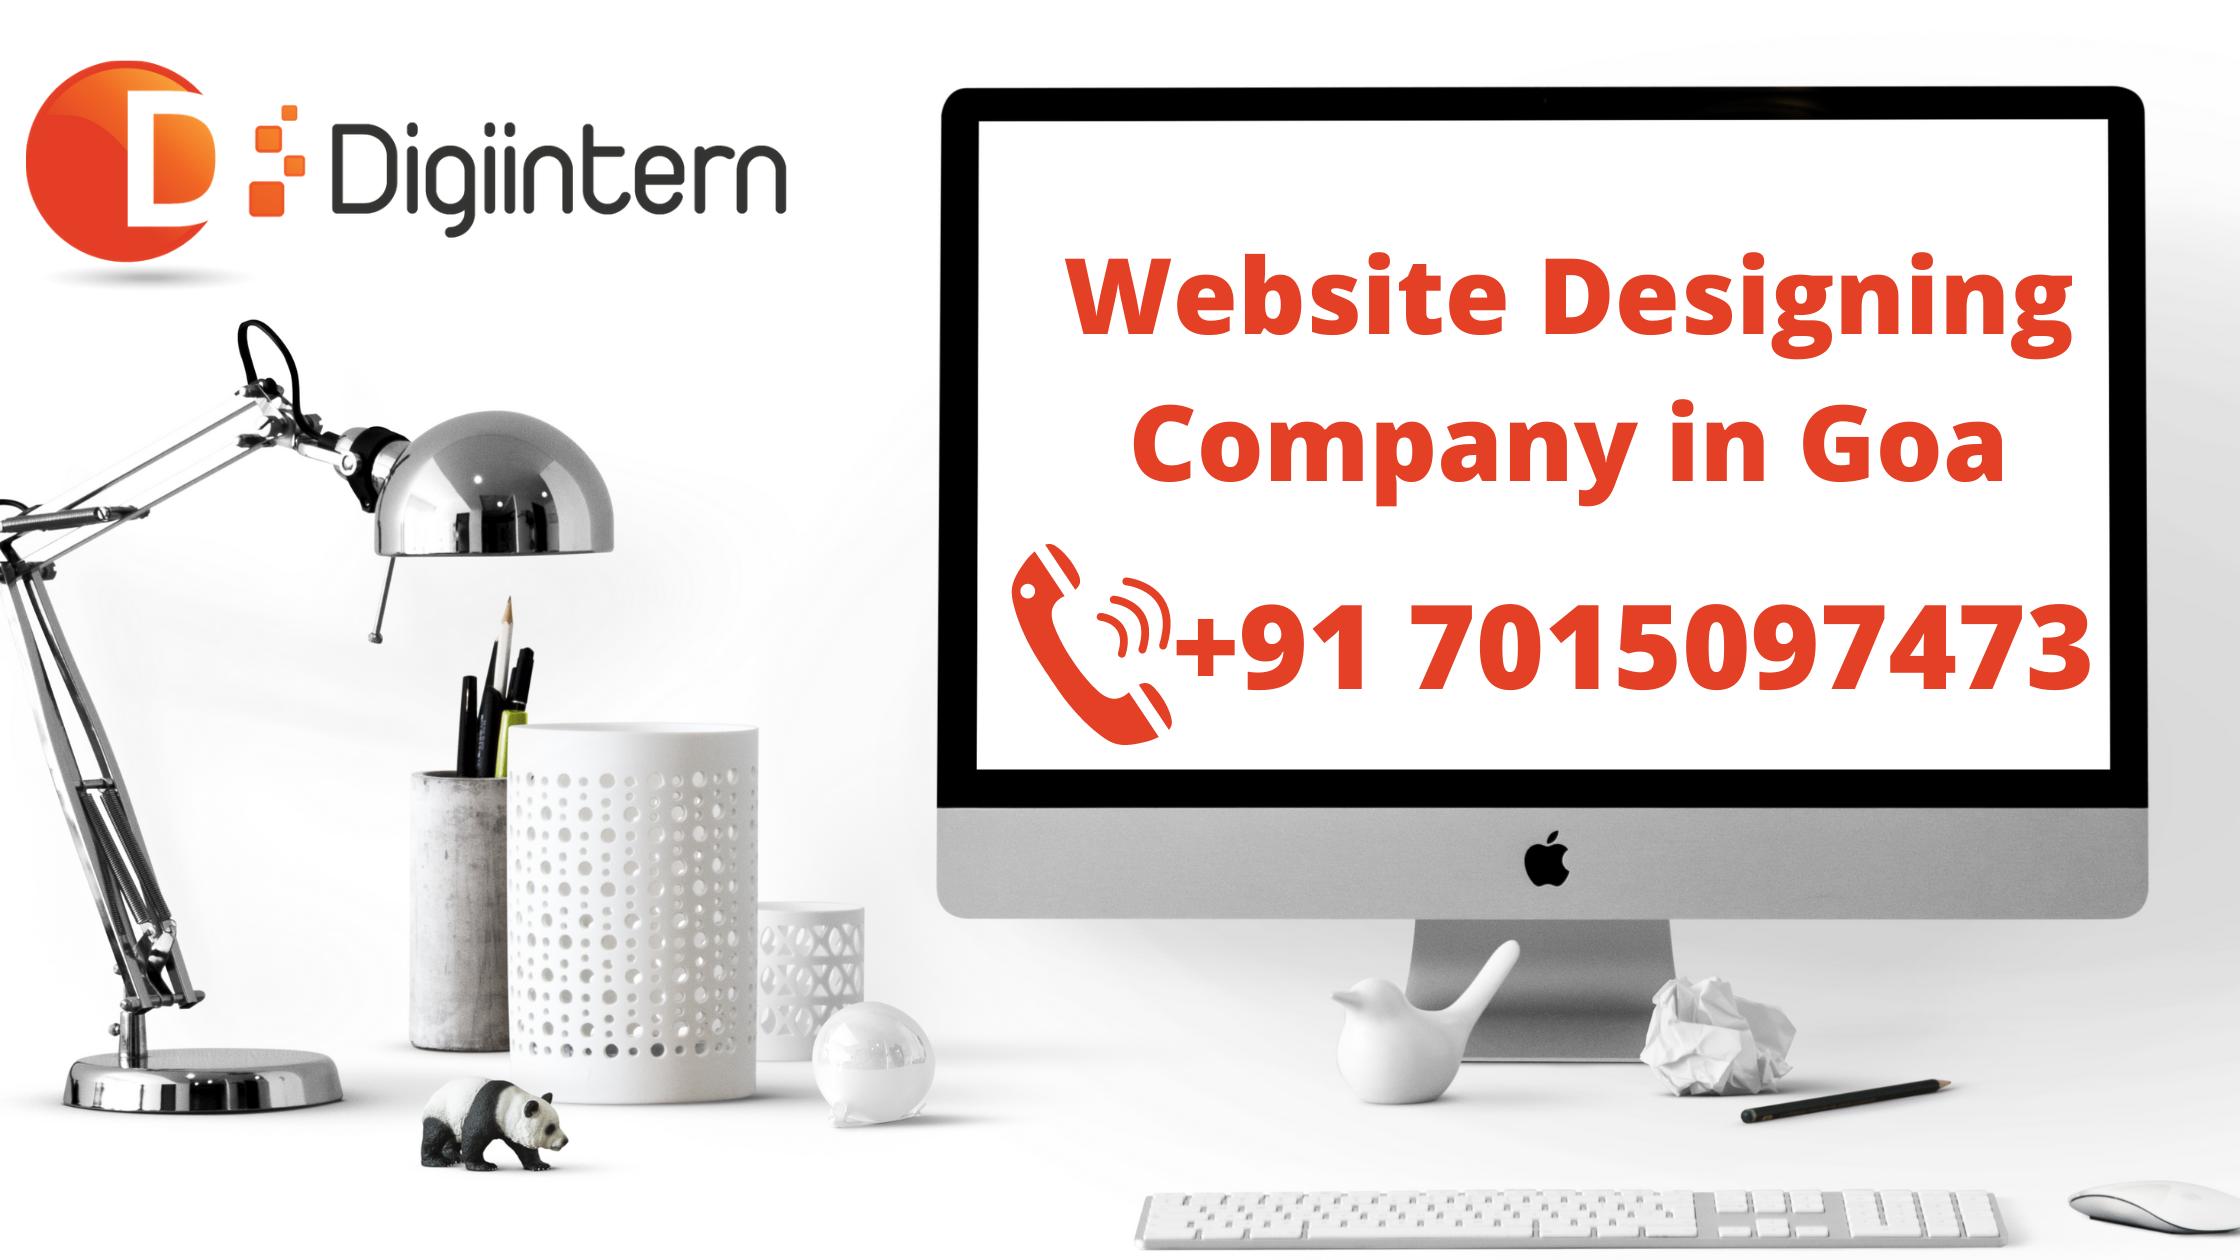 Website Designing Company in Goa